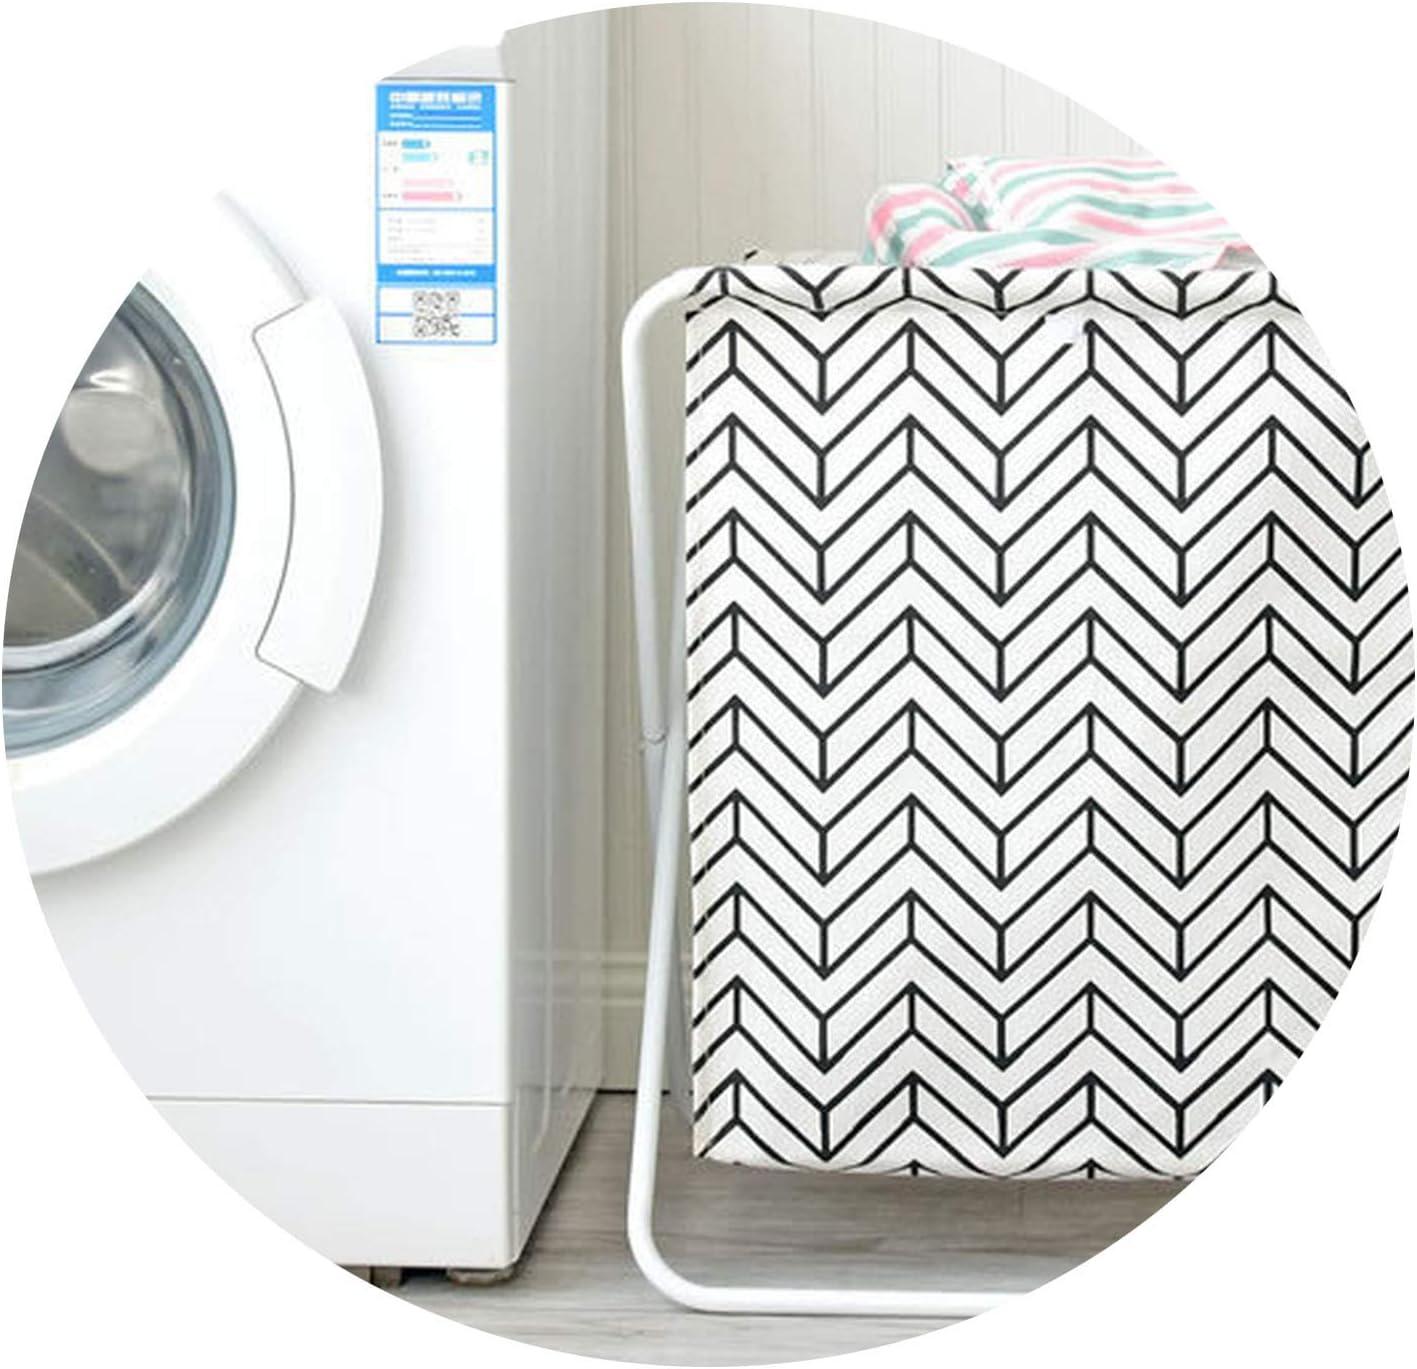 Krystal_wisdom Large Laundry Basket Iron Shelf Baby Toys Basket Washing Basket for Dirty Clothes Laundry Hamper Cotton Linen Organizer Bags,2